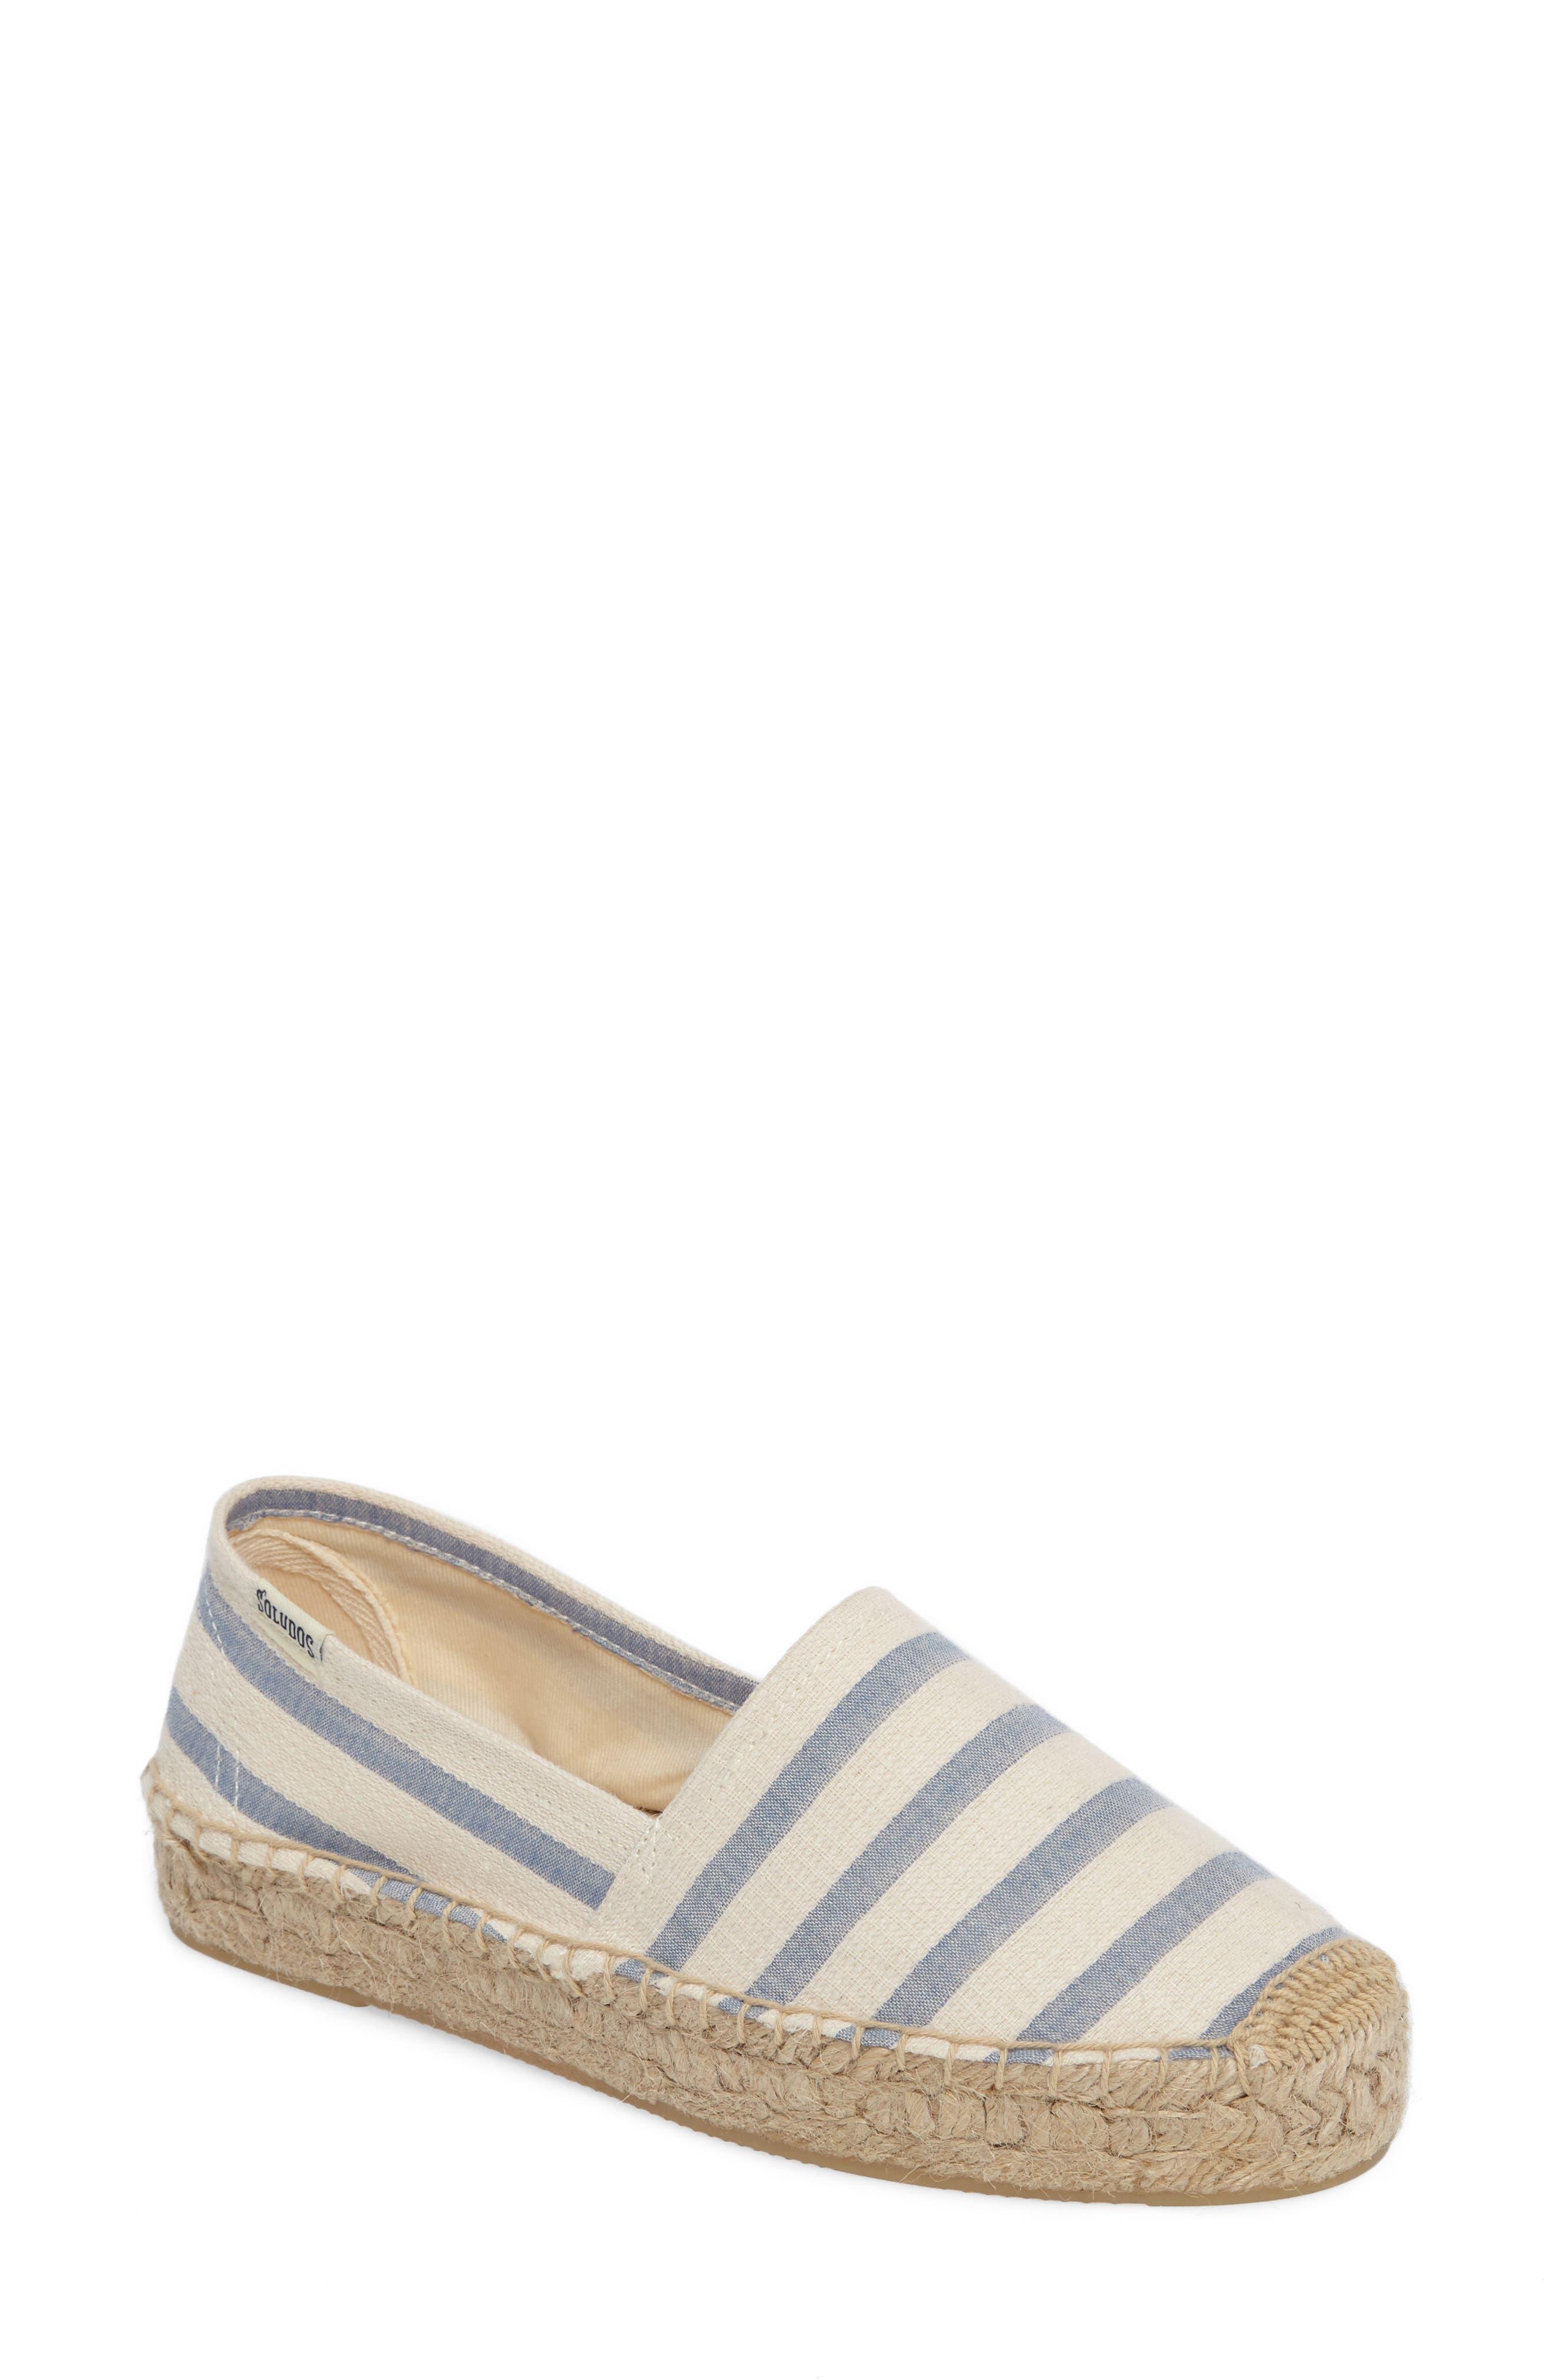 Soludos Stripe Original Platform Espadrille (Women)